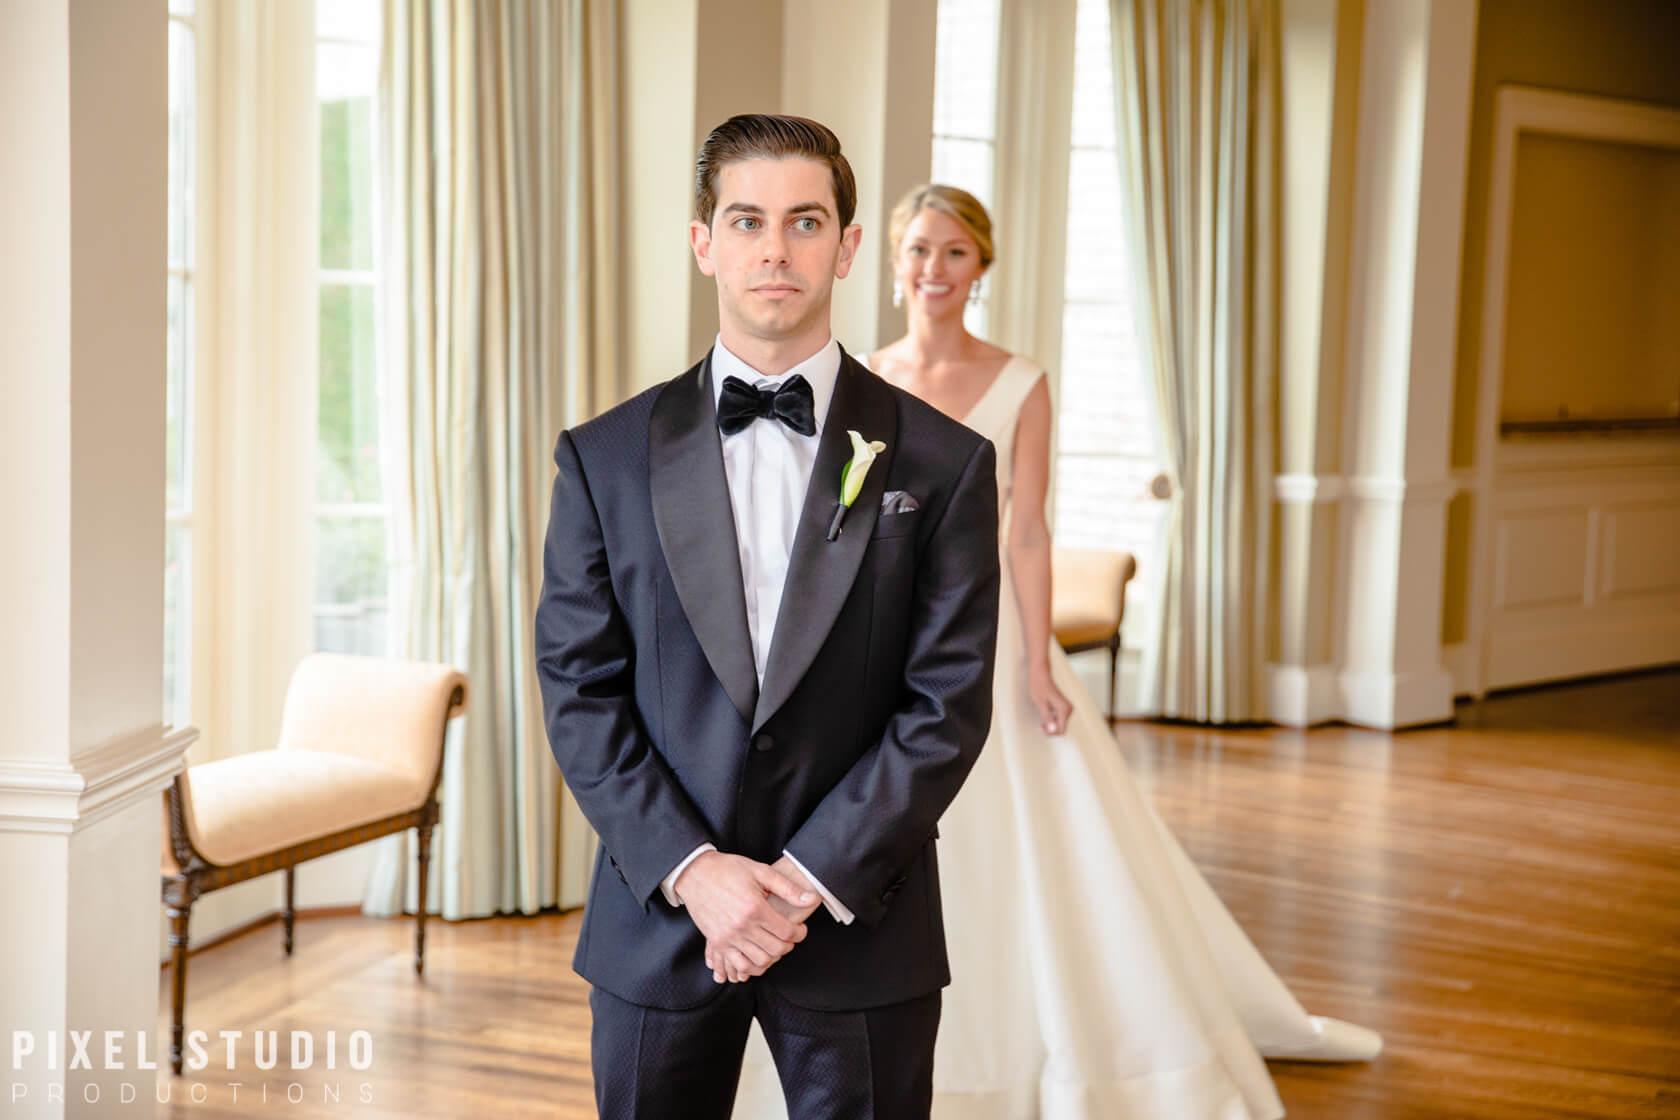 wedding-photo shoots when groom sees